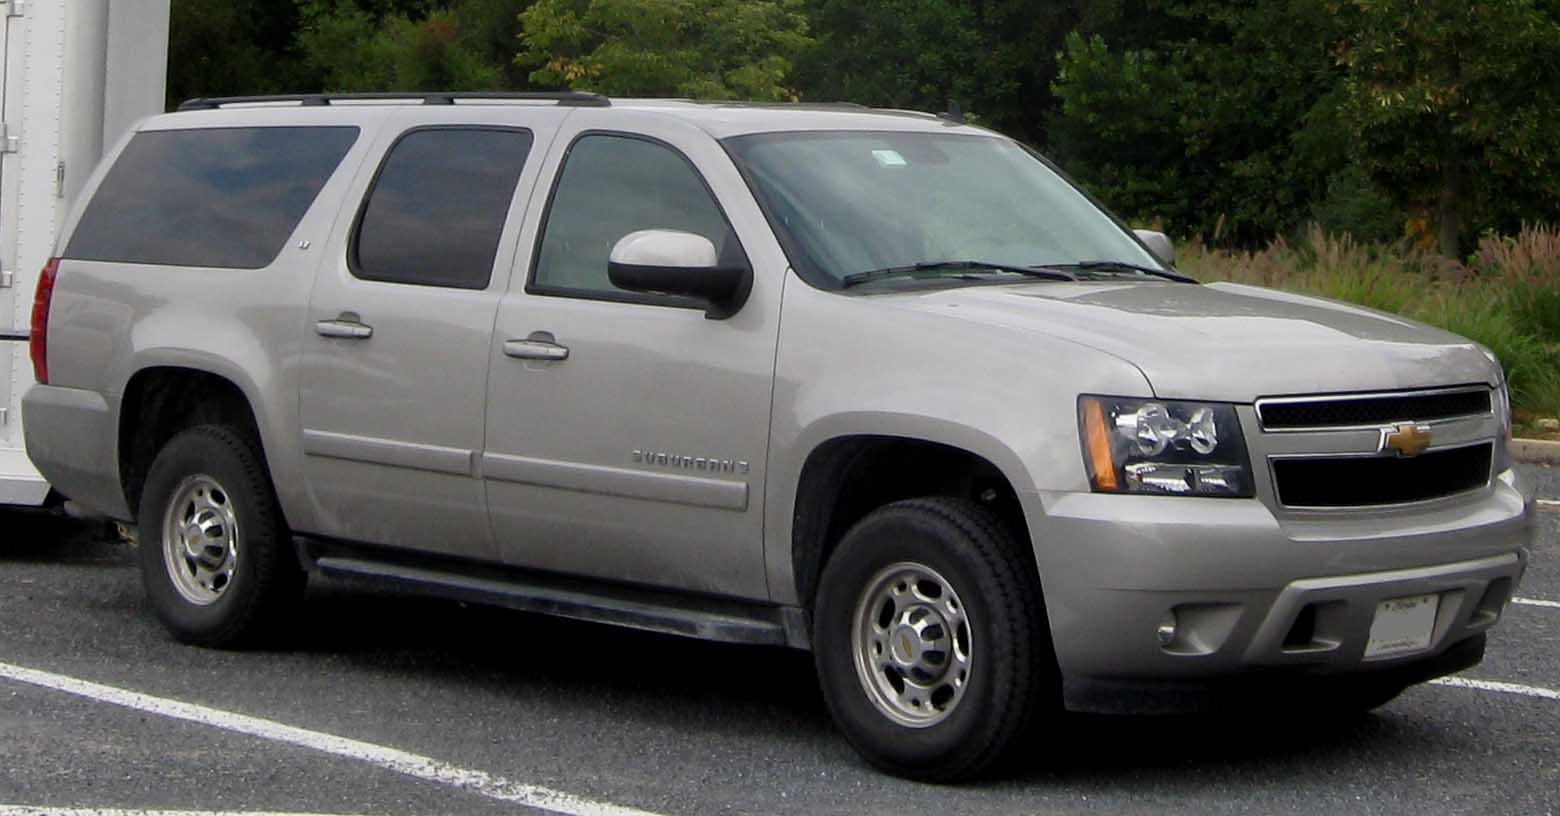 Chevrolet LUV 2004 foto - 1